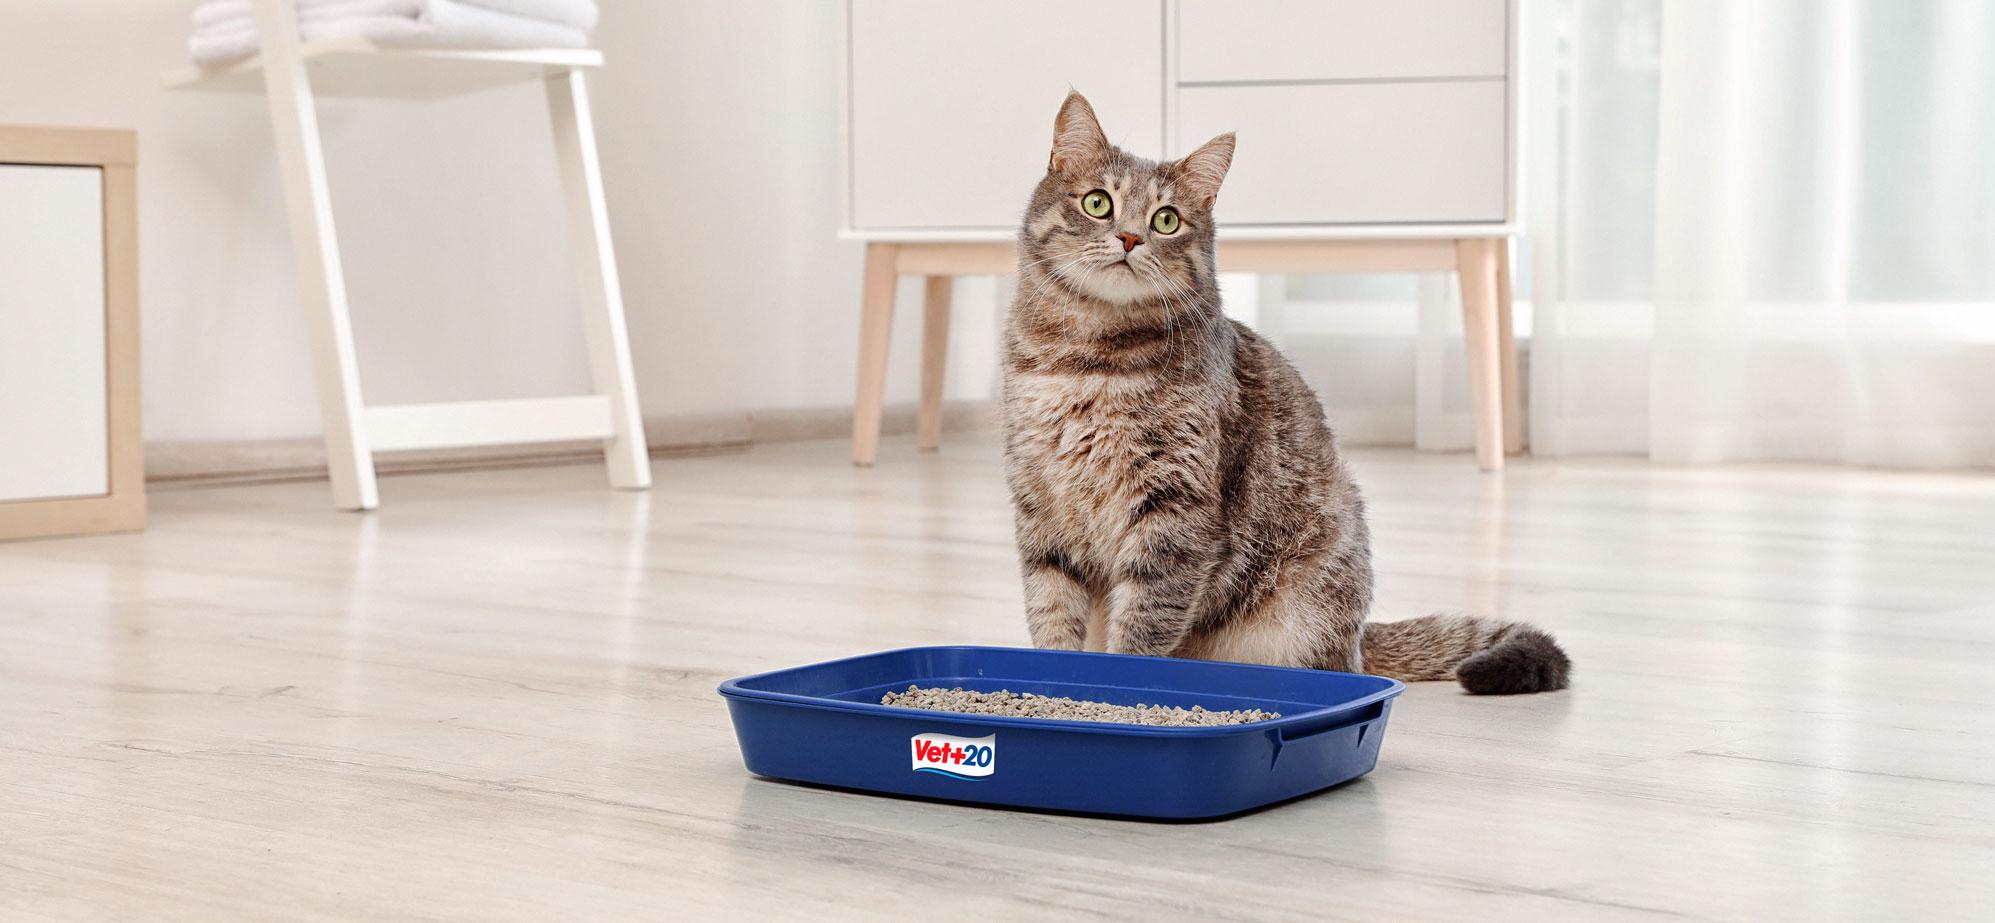 Gato ao lado da caixa de areia